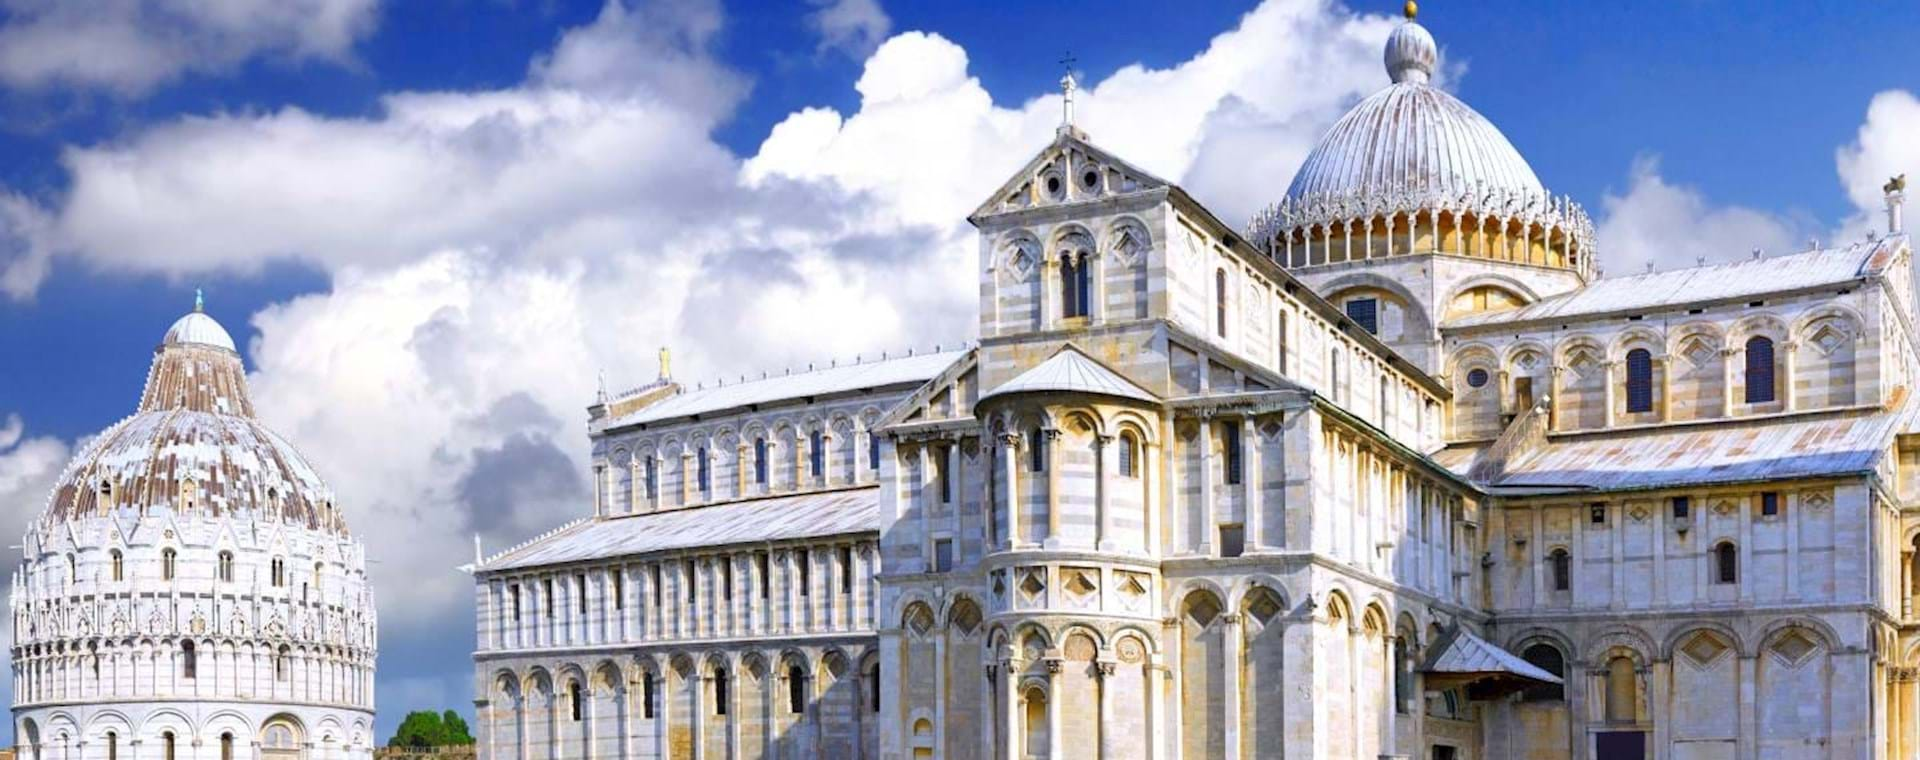 Day Trip: Pisa, Siena & San Gimignano with Artisan Food & Wine Sampling